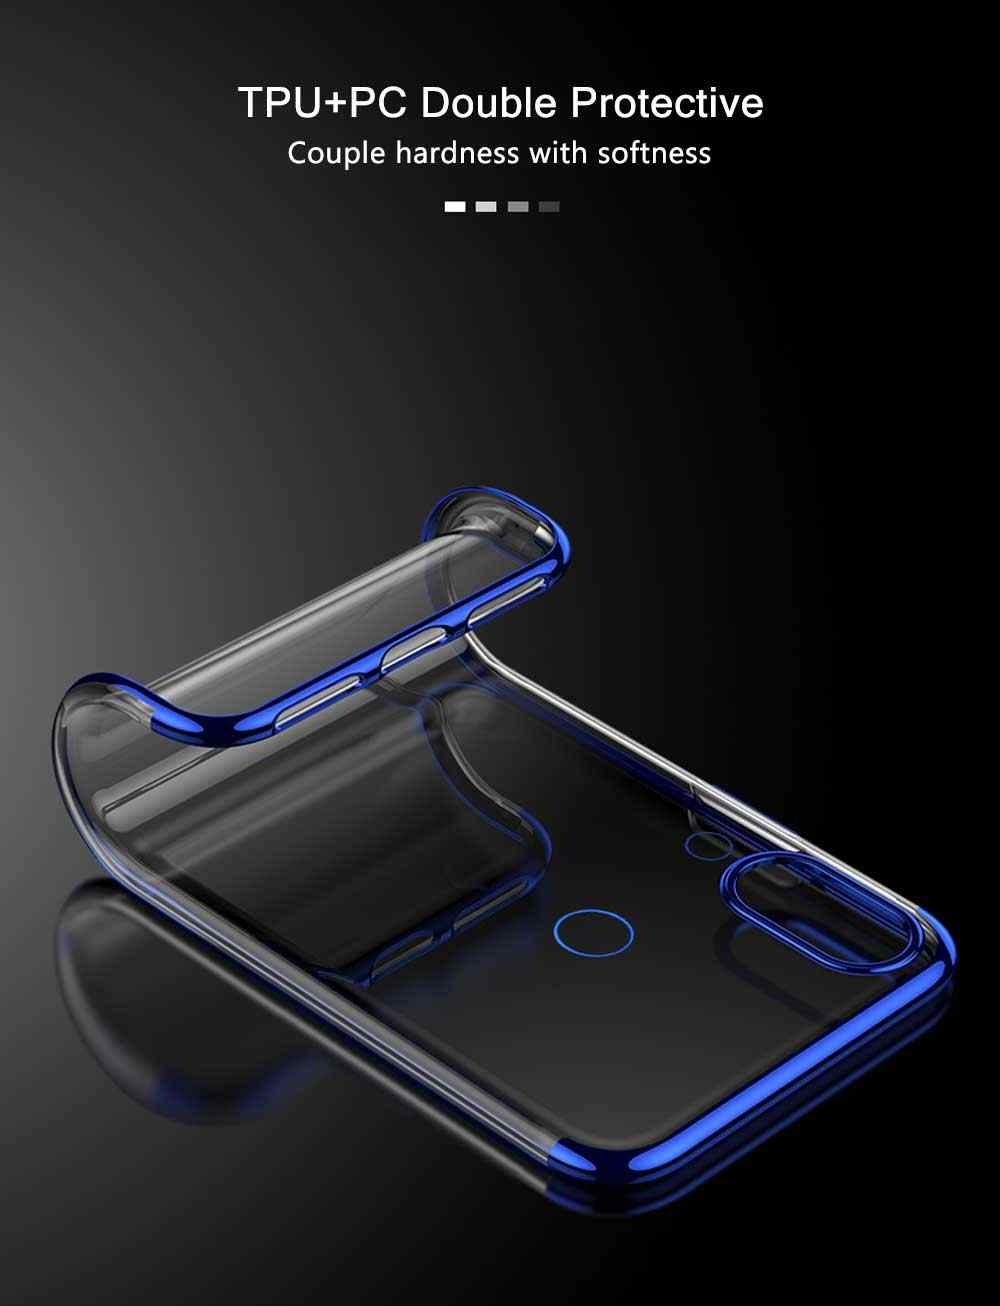 Olhveitra الهاتف Fundas ل Xiaomi Redmi ملاحظة 7 6 5 برو Redmi 5 زائد 6A S2 Y2 Redmi 7 حالة TPU لينة الفاخرة تصفيح السيليكون غطاء